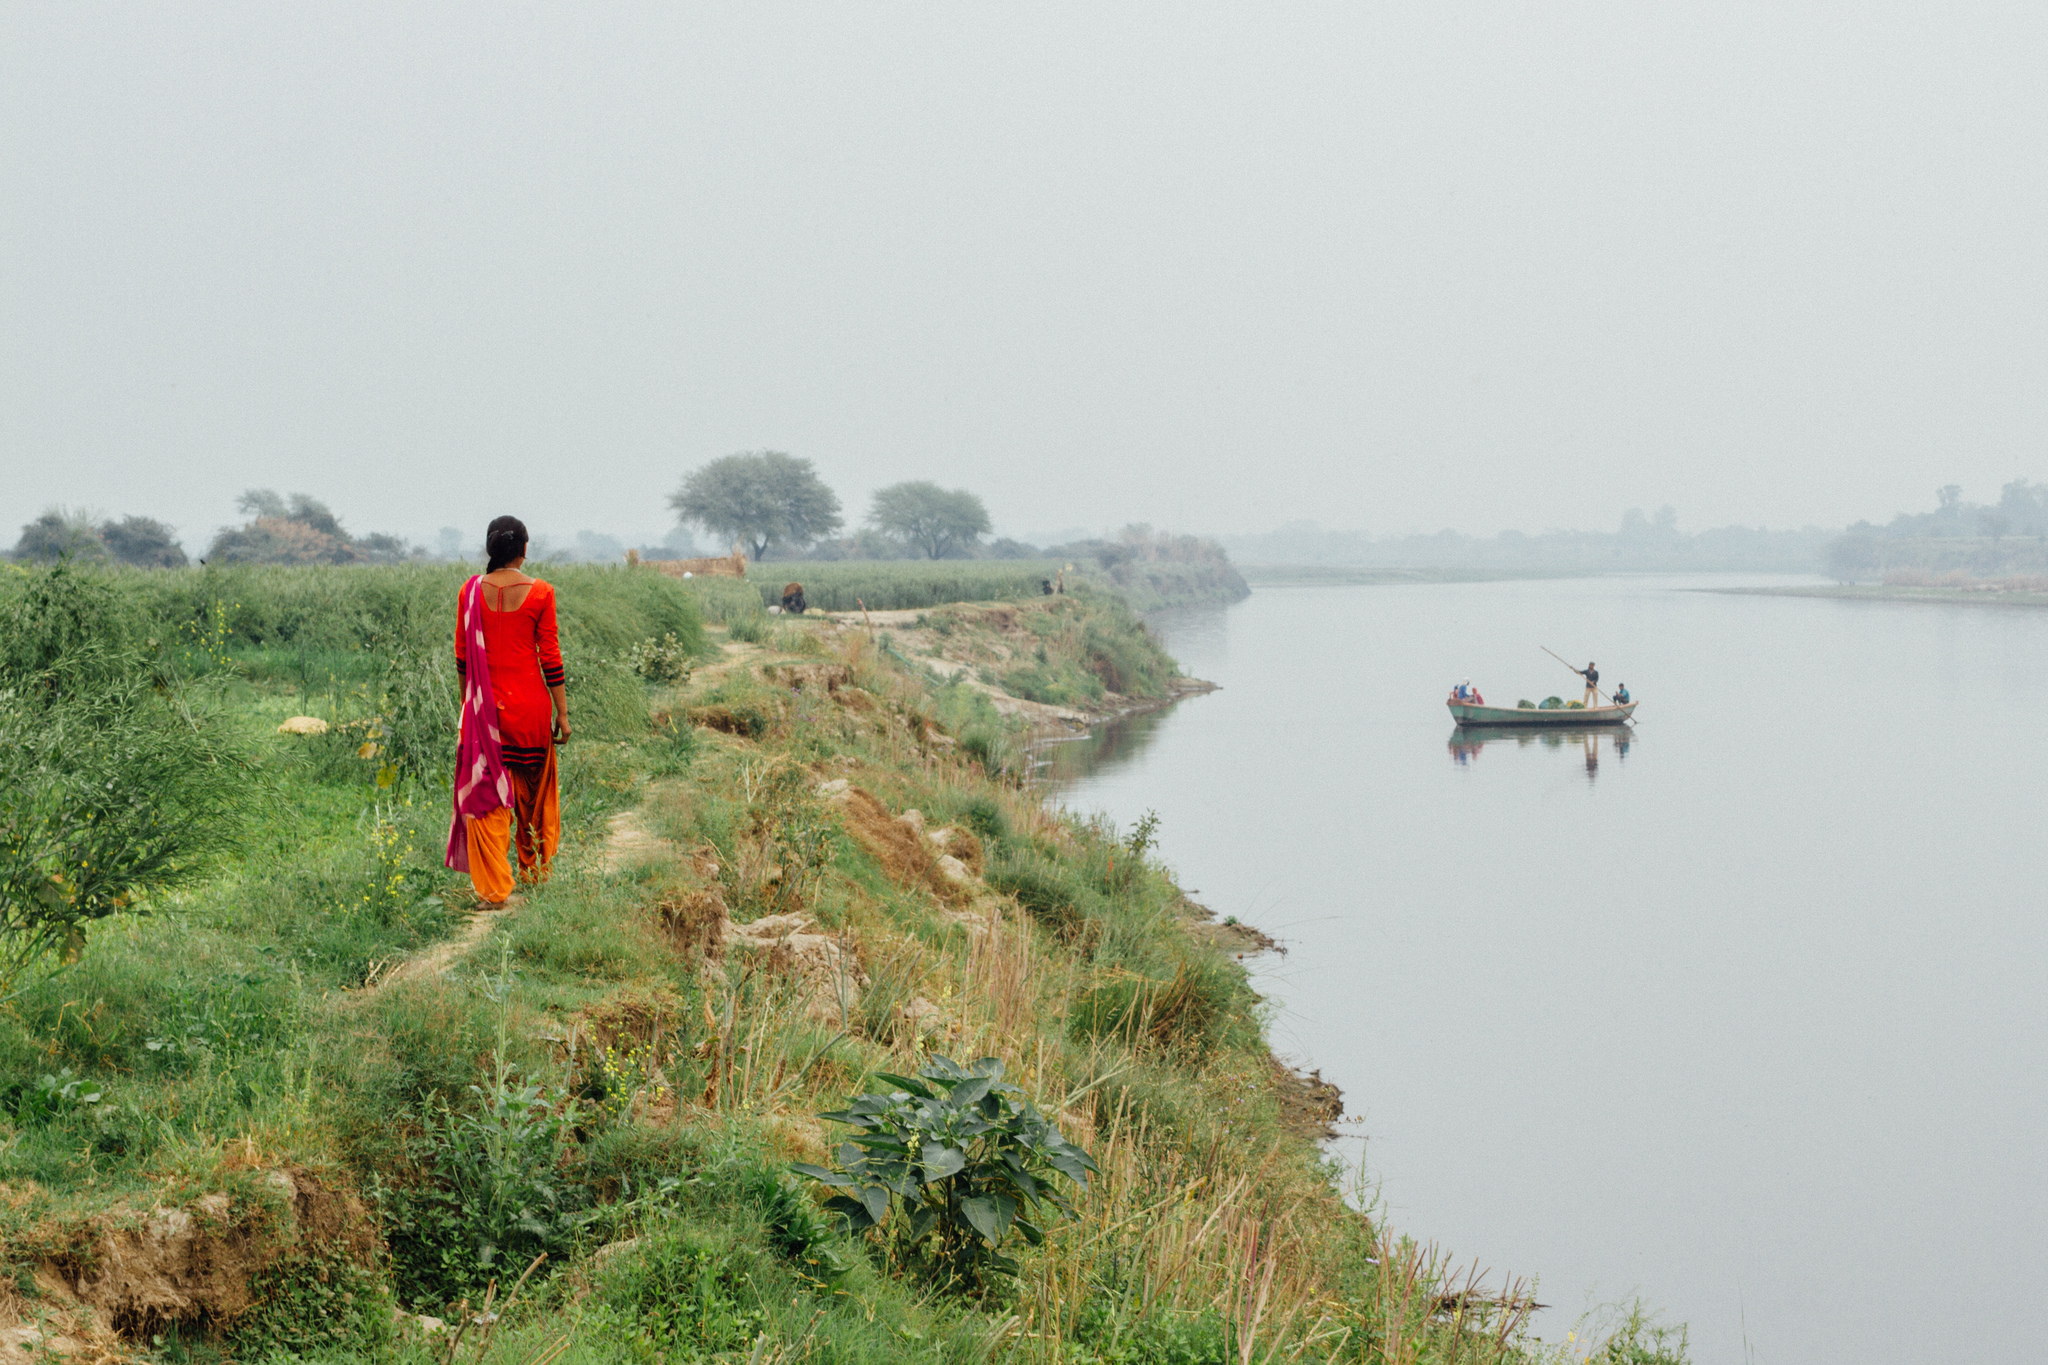 women's land rights SDGs